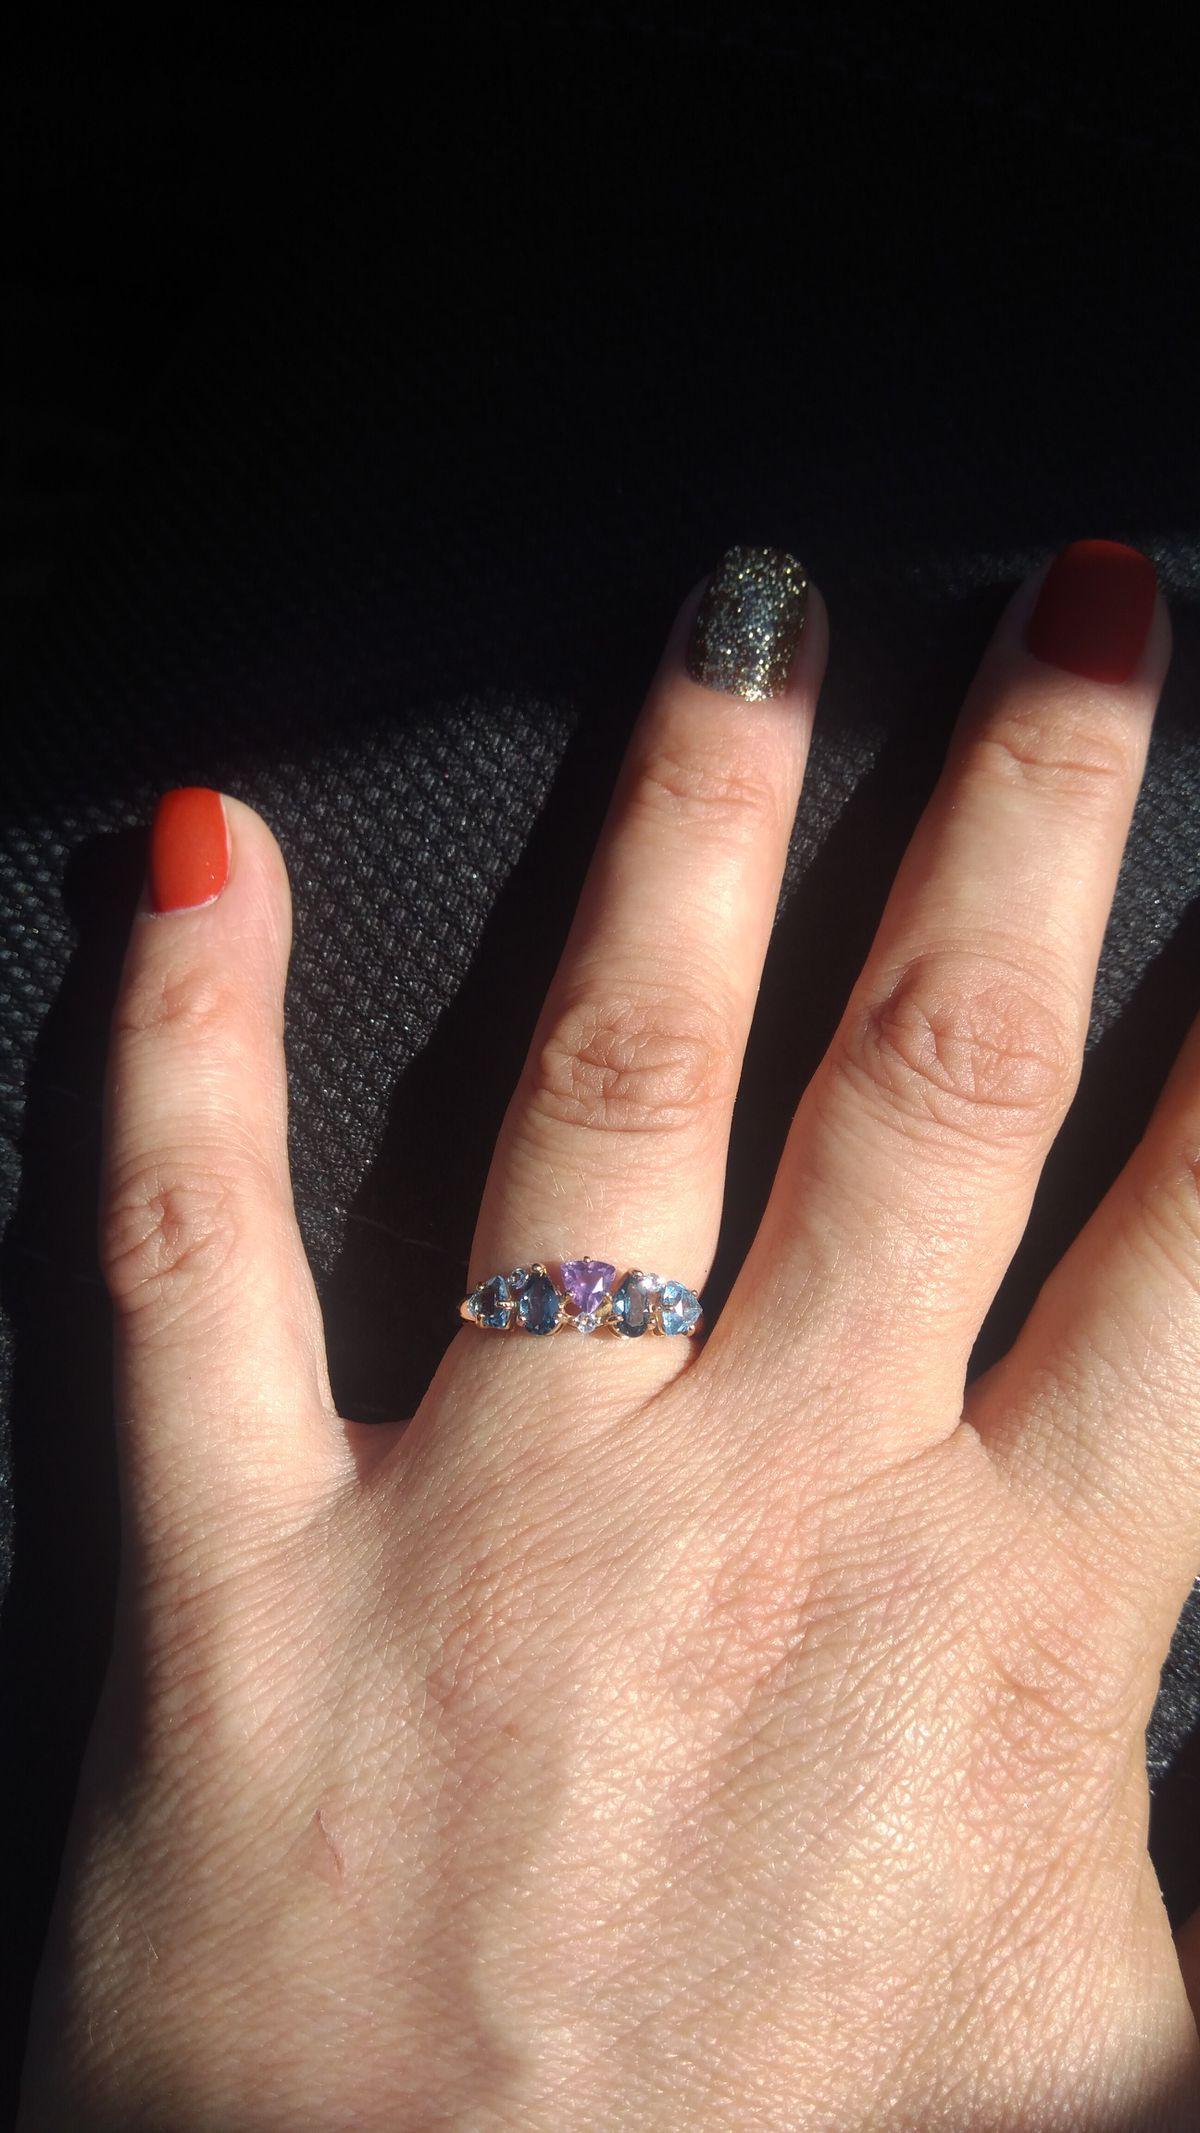 Давно хотела кольцо с аметистом.